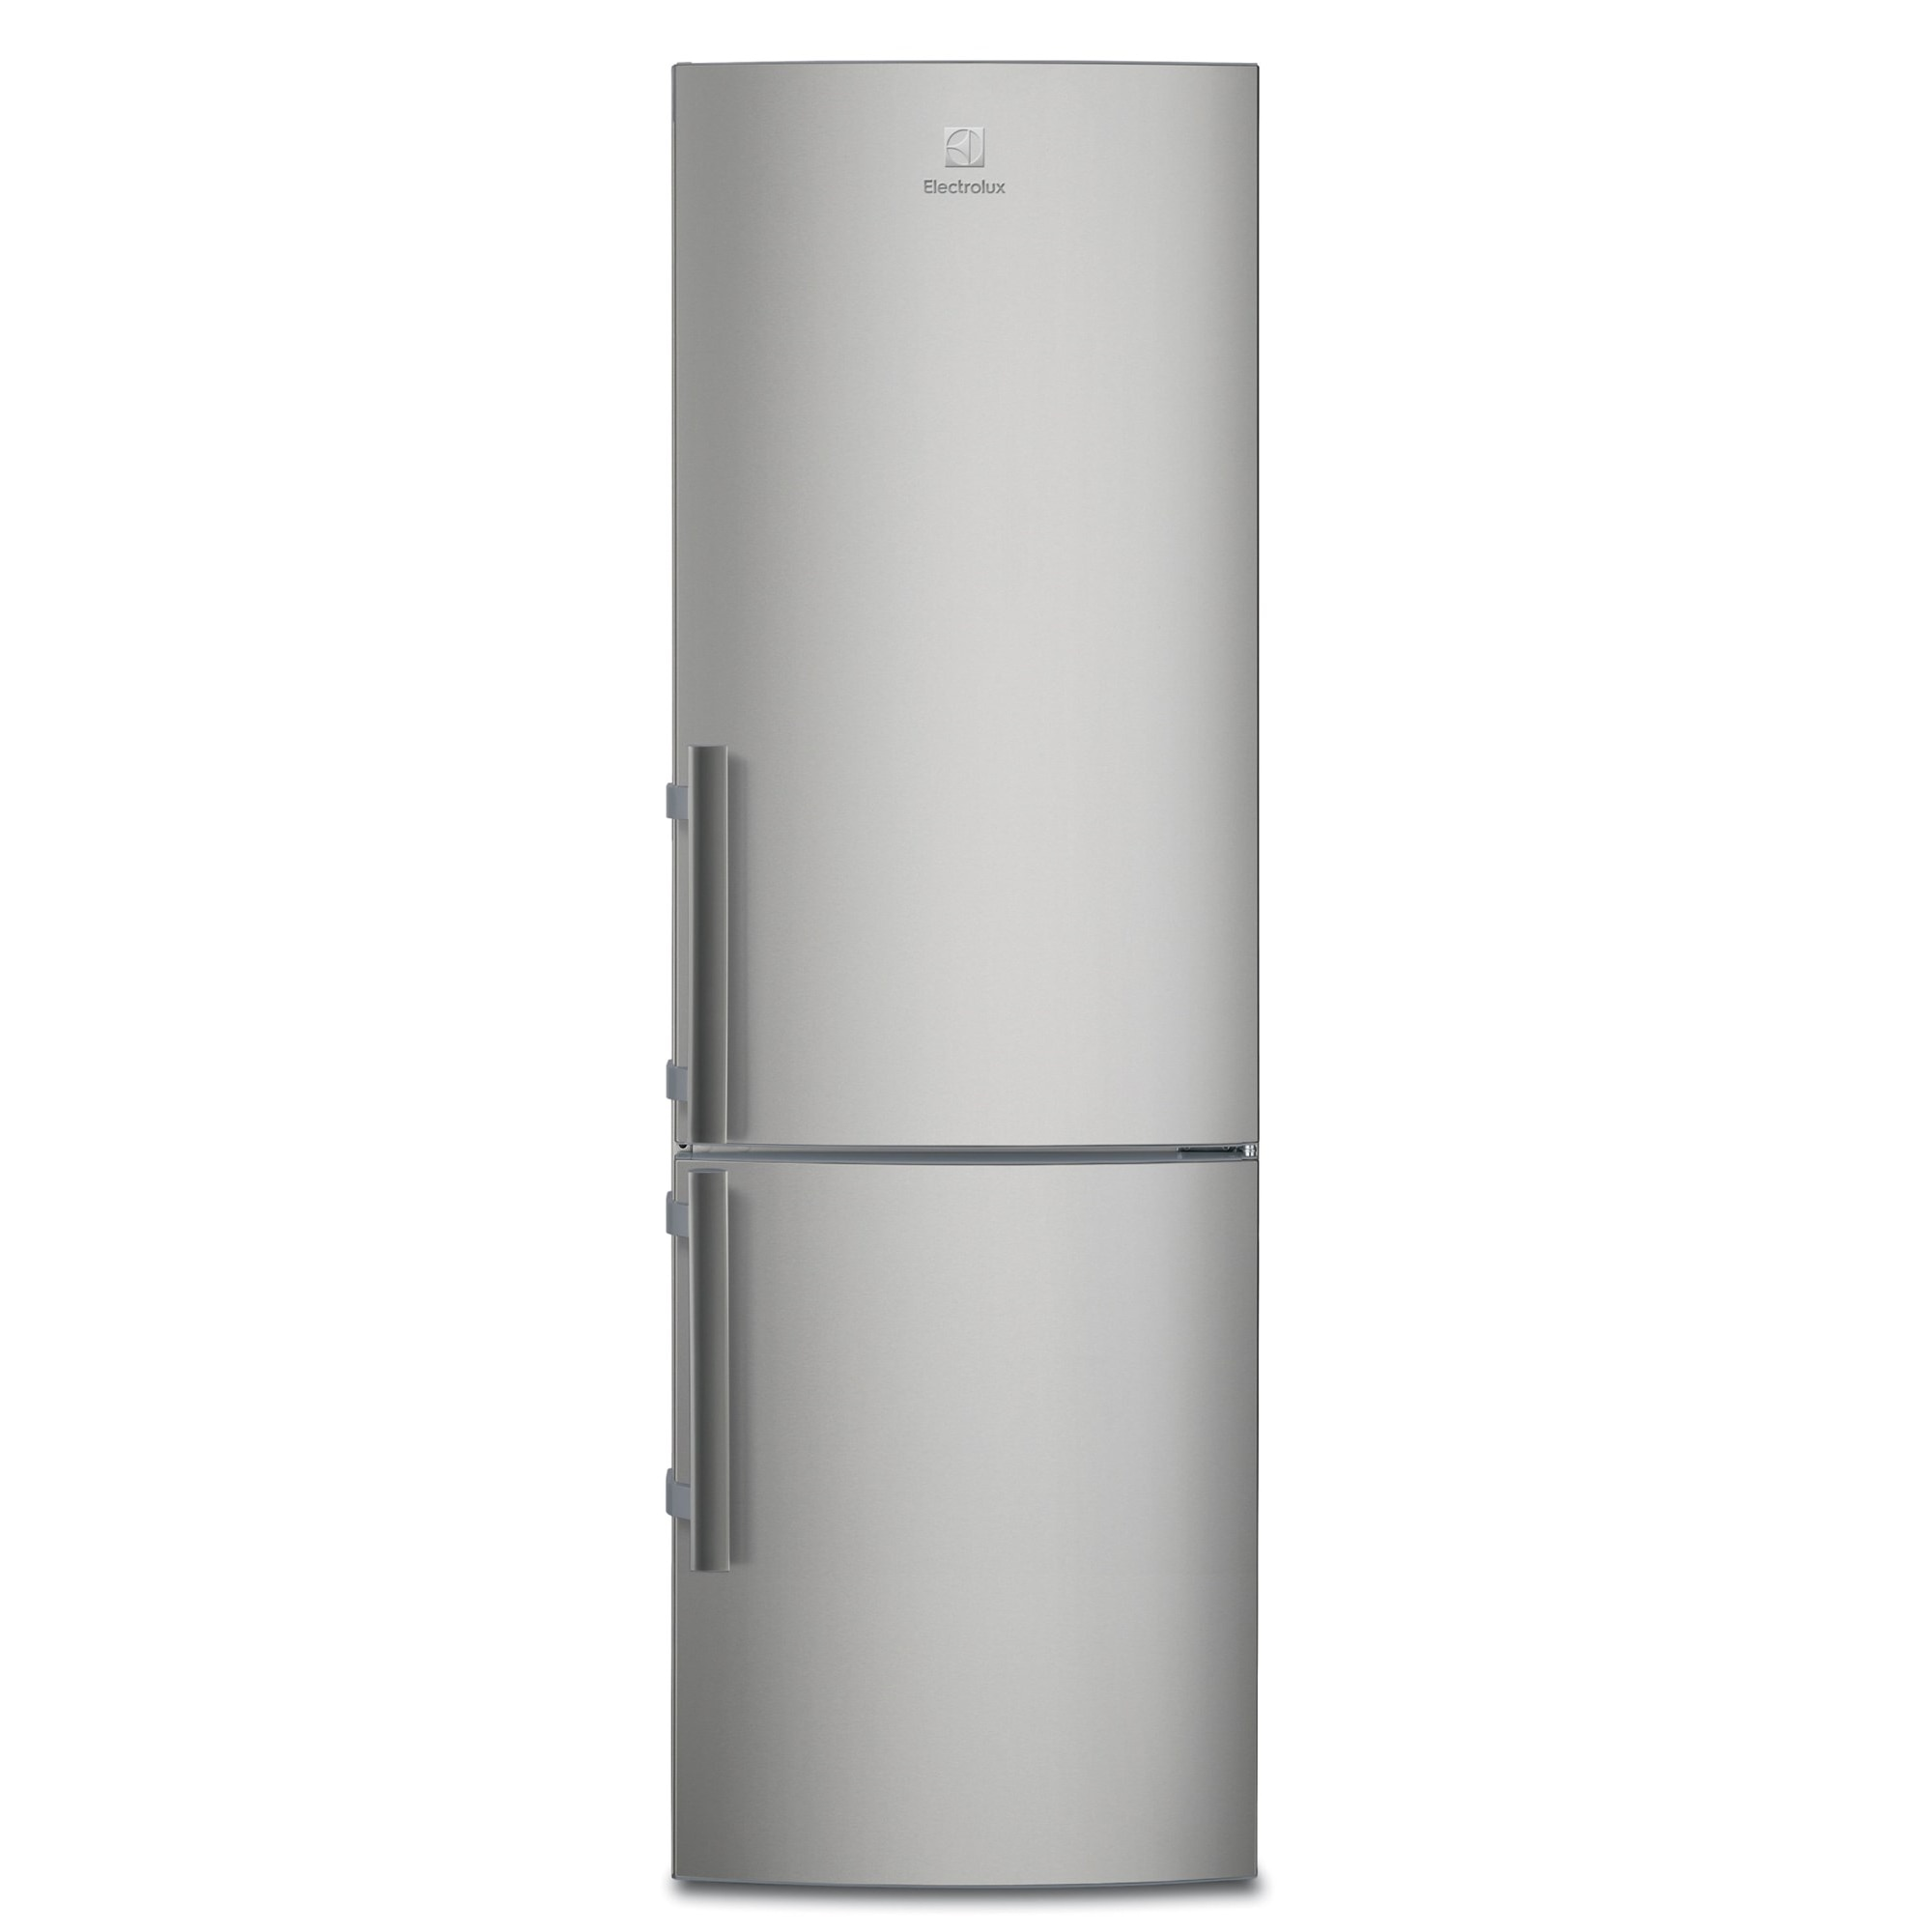 Fotografie Combina frigorifica Electrolux EN3601MOX, 337 l, Clasa A++, H 185 cm, Inox antiamprenta